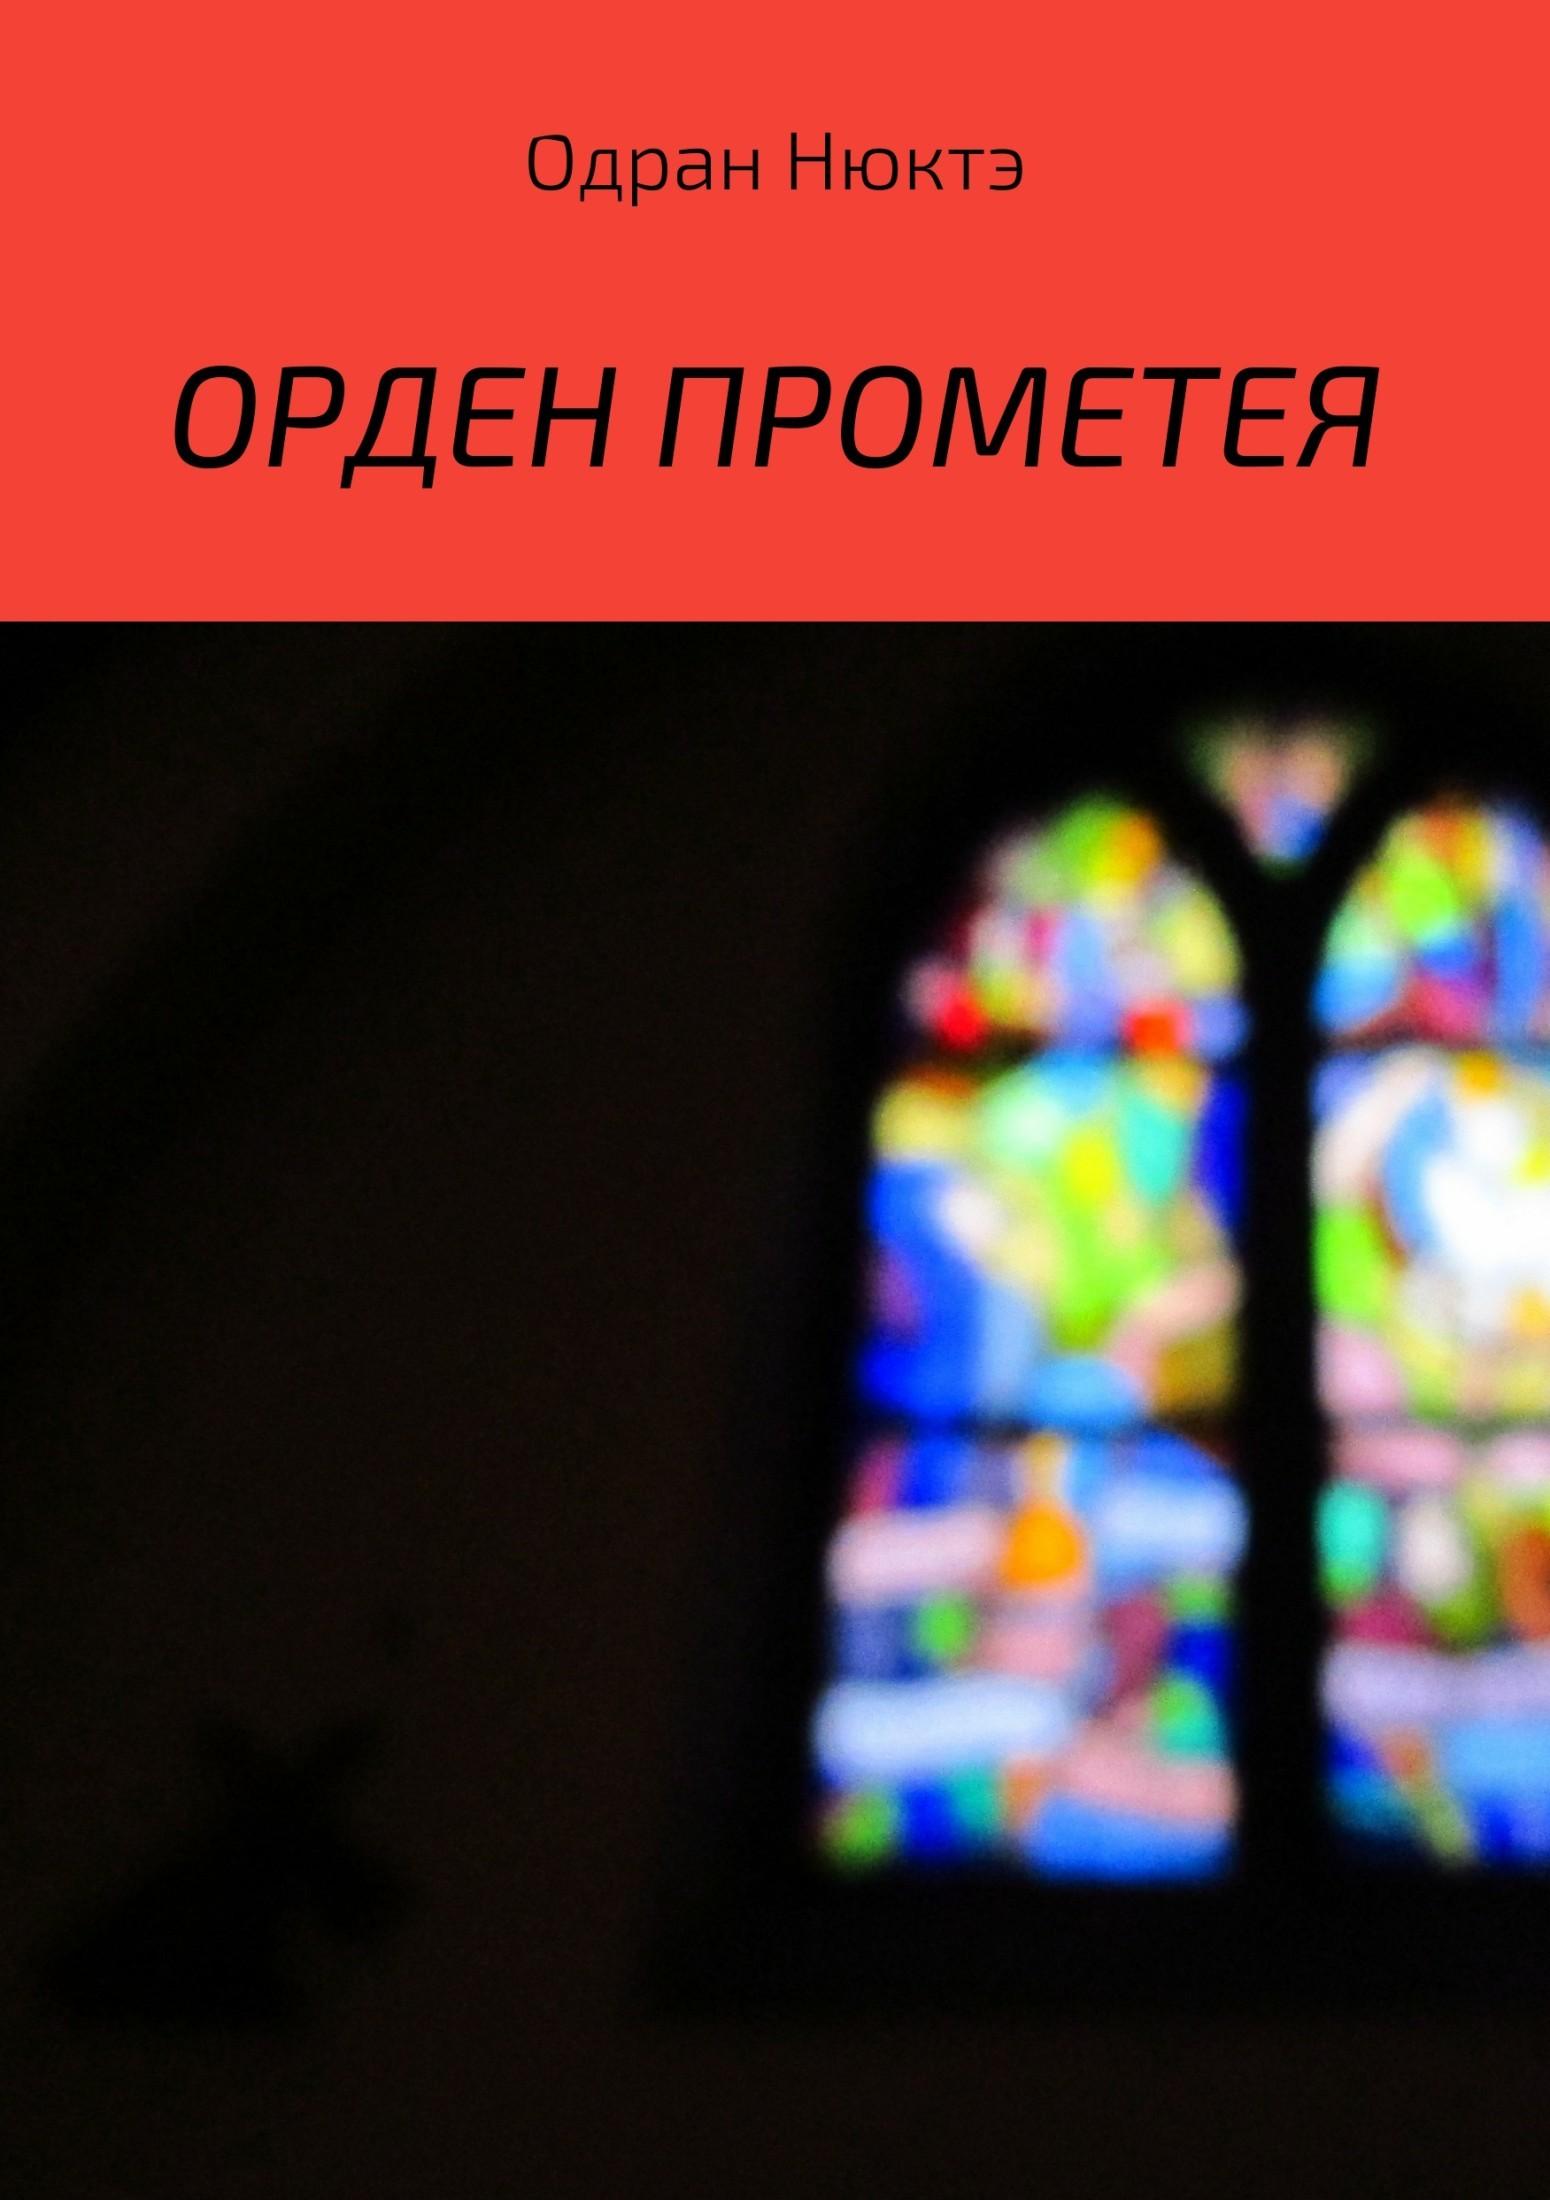 Одран Нюктэ Орден Прометея одран нюктэ бесконечно далек сборник стихов